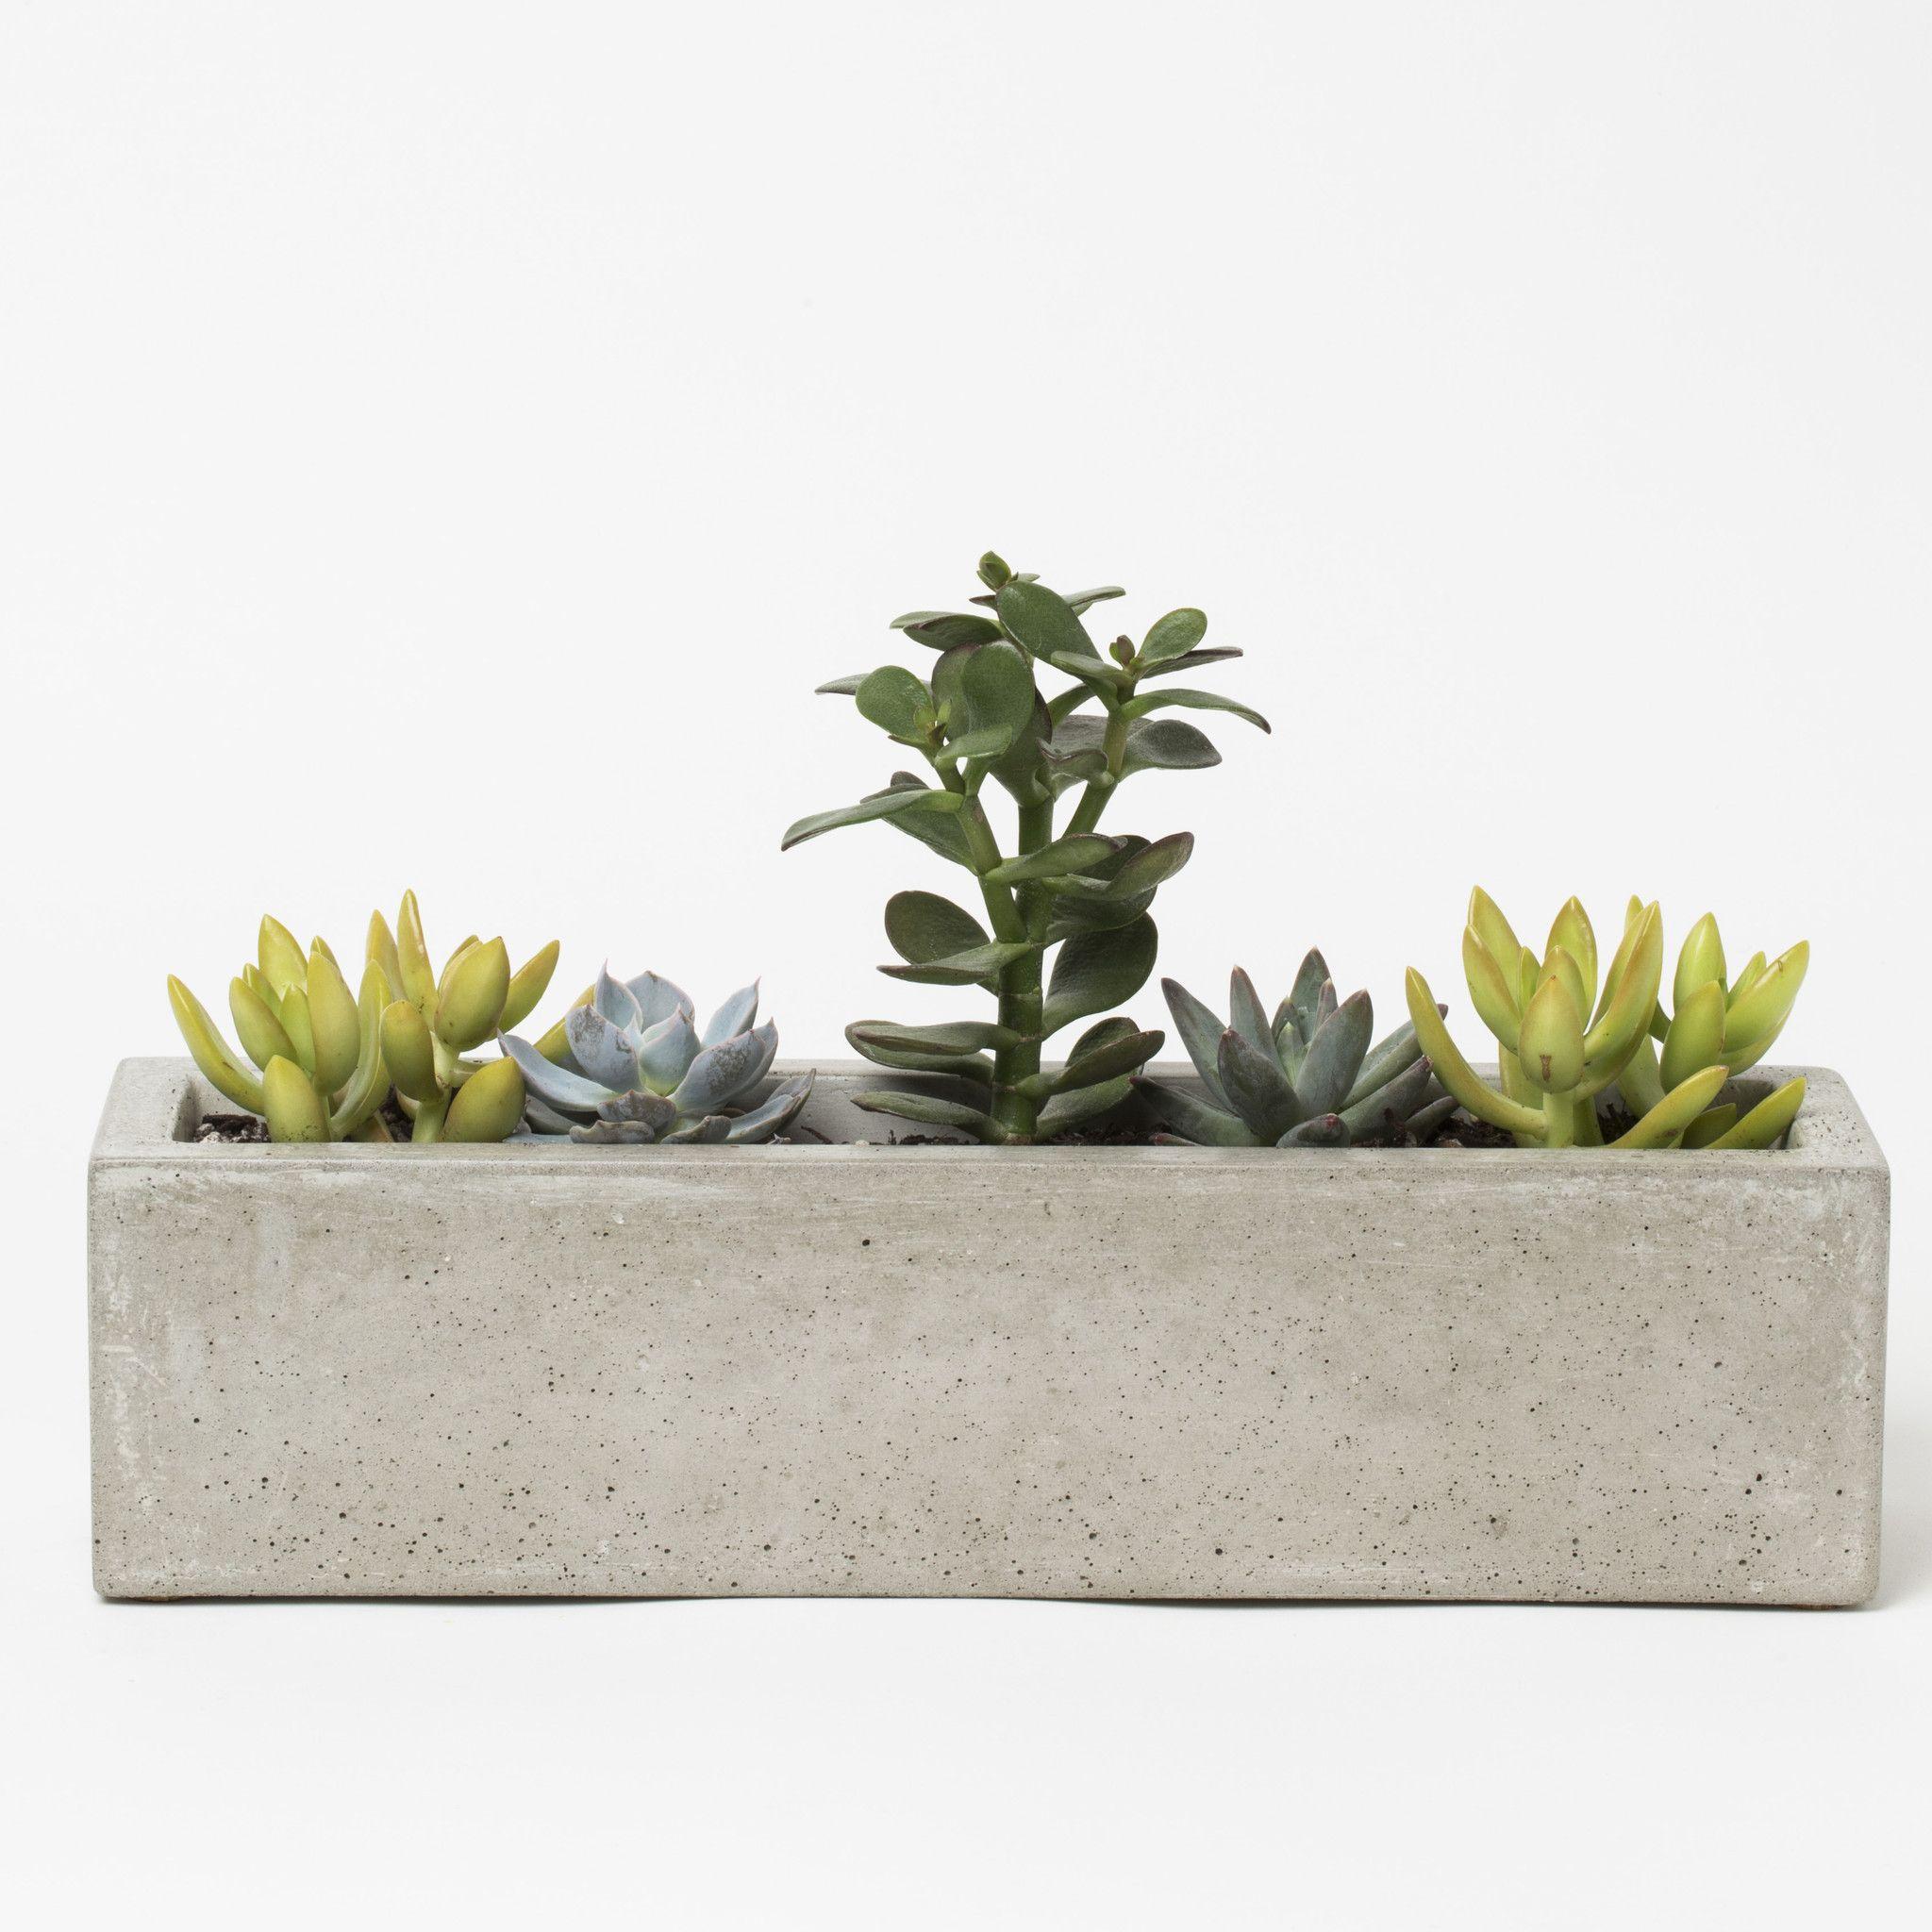 plants not included Concrete house planter